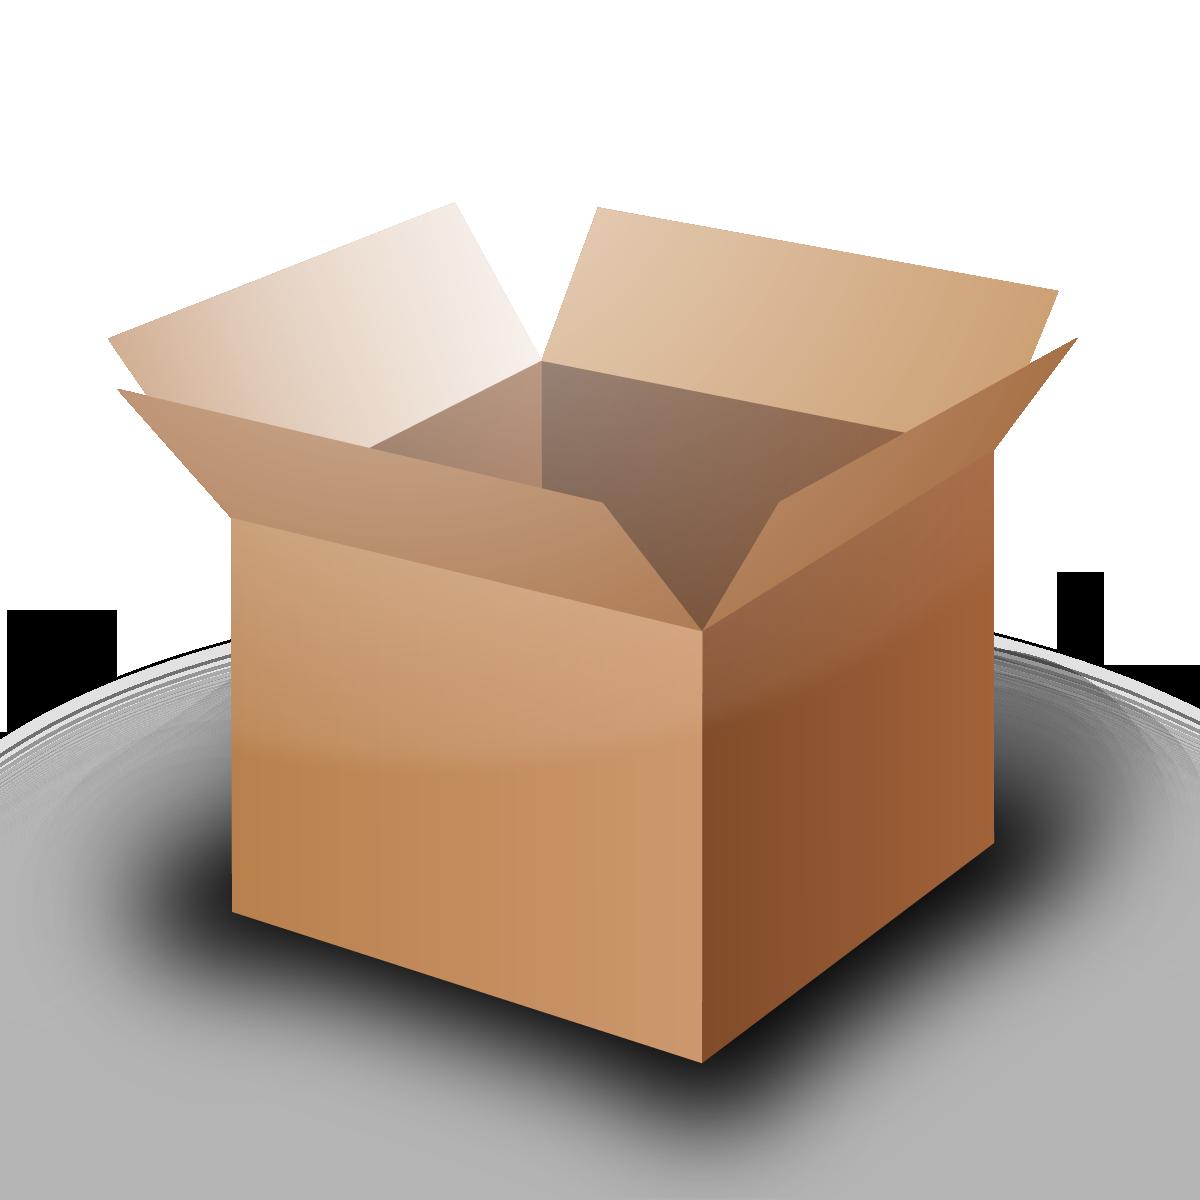 Open_cardboard_box_husky